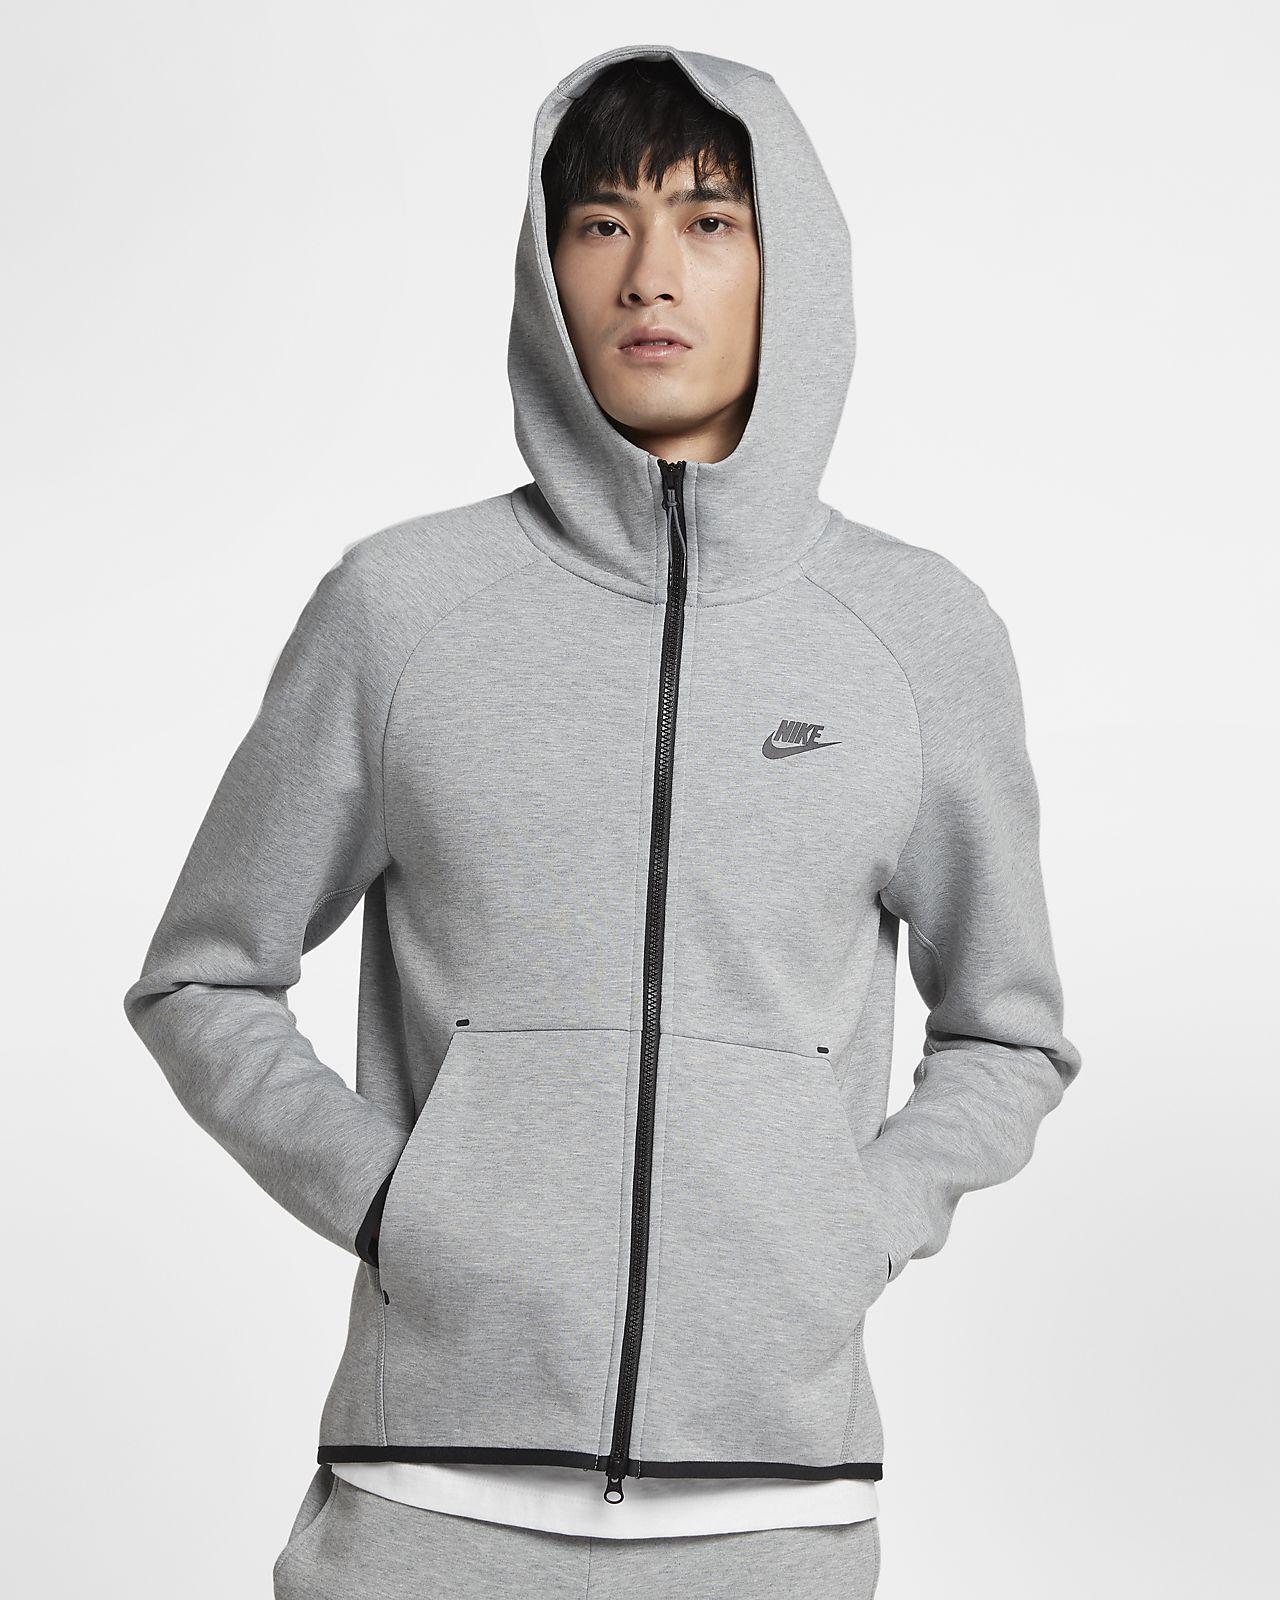 Мужская худи с молнией во всю длину Nike Sportswear Tech Fleece